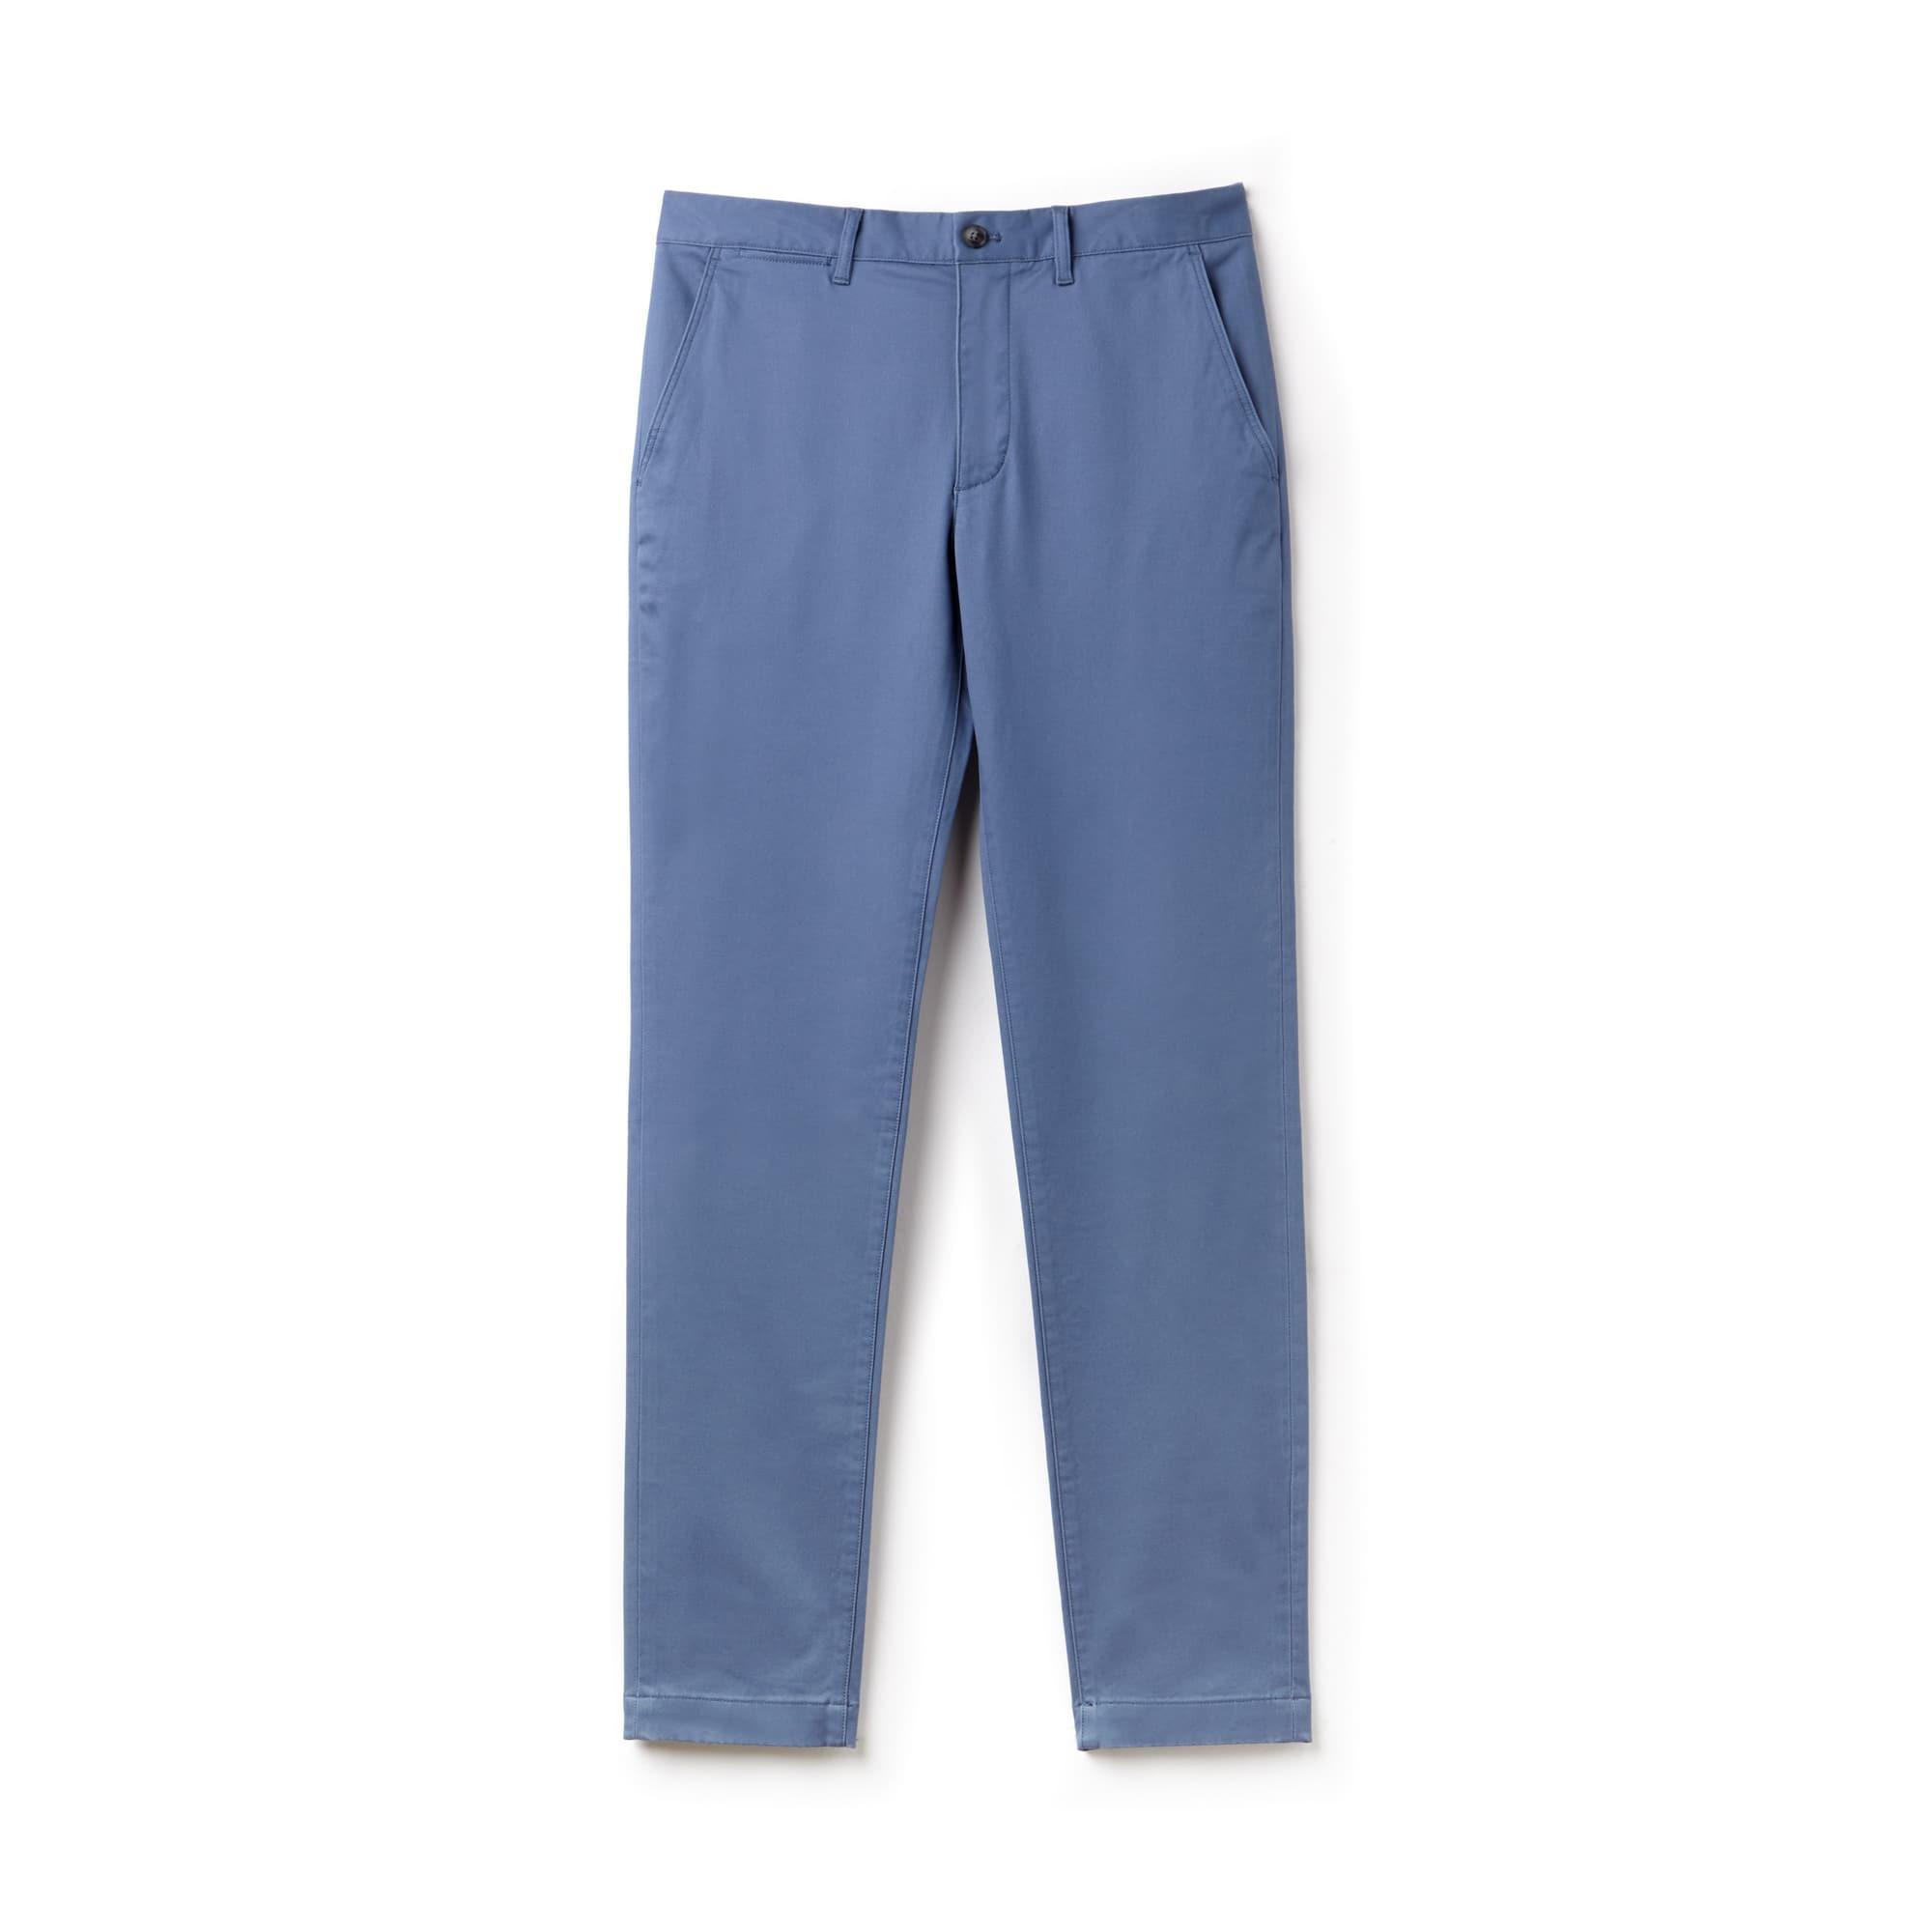 Pantalón chino slim fit de gabardina elástica lisa